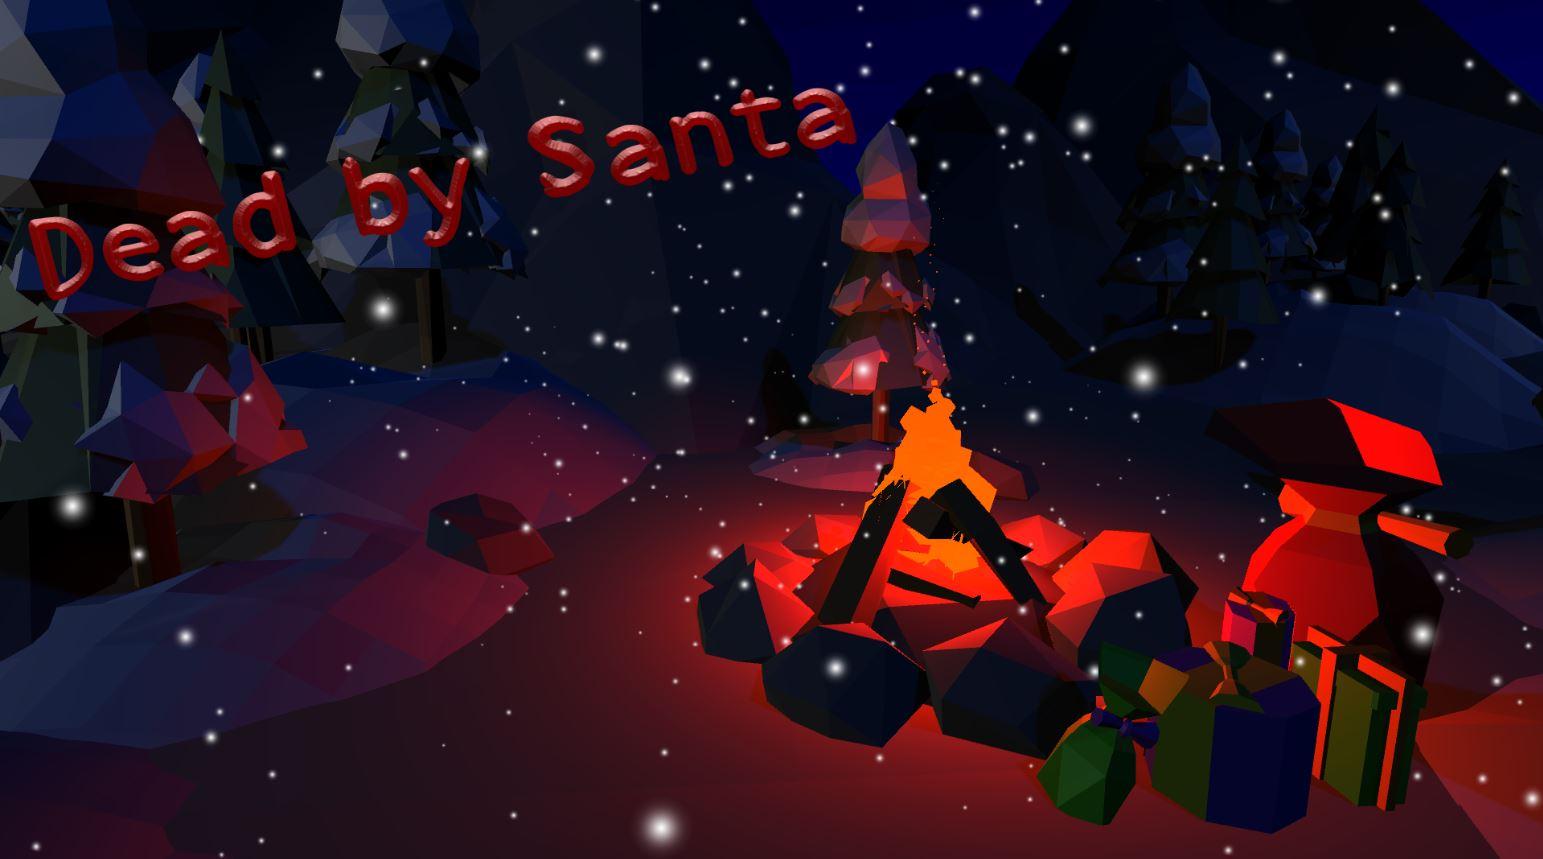 Dead by Santa